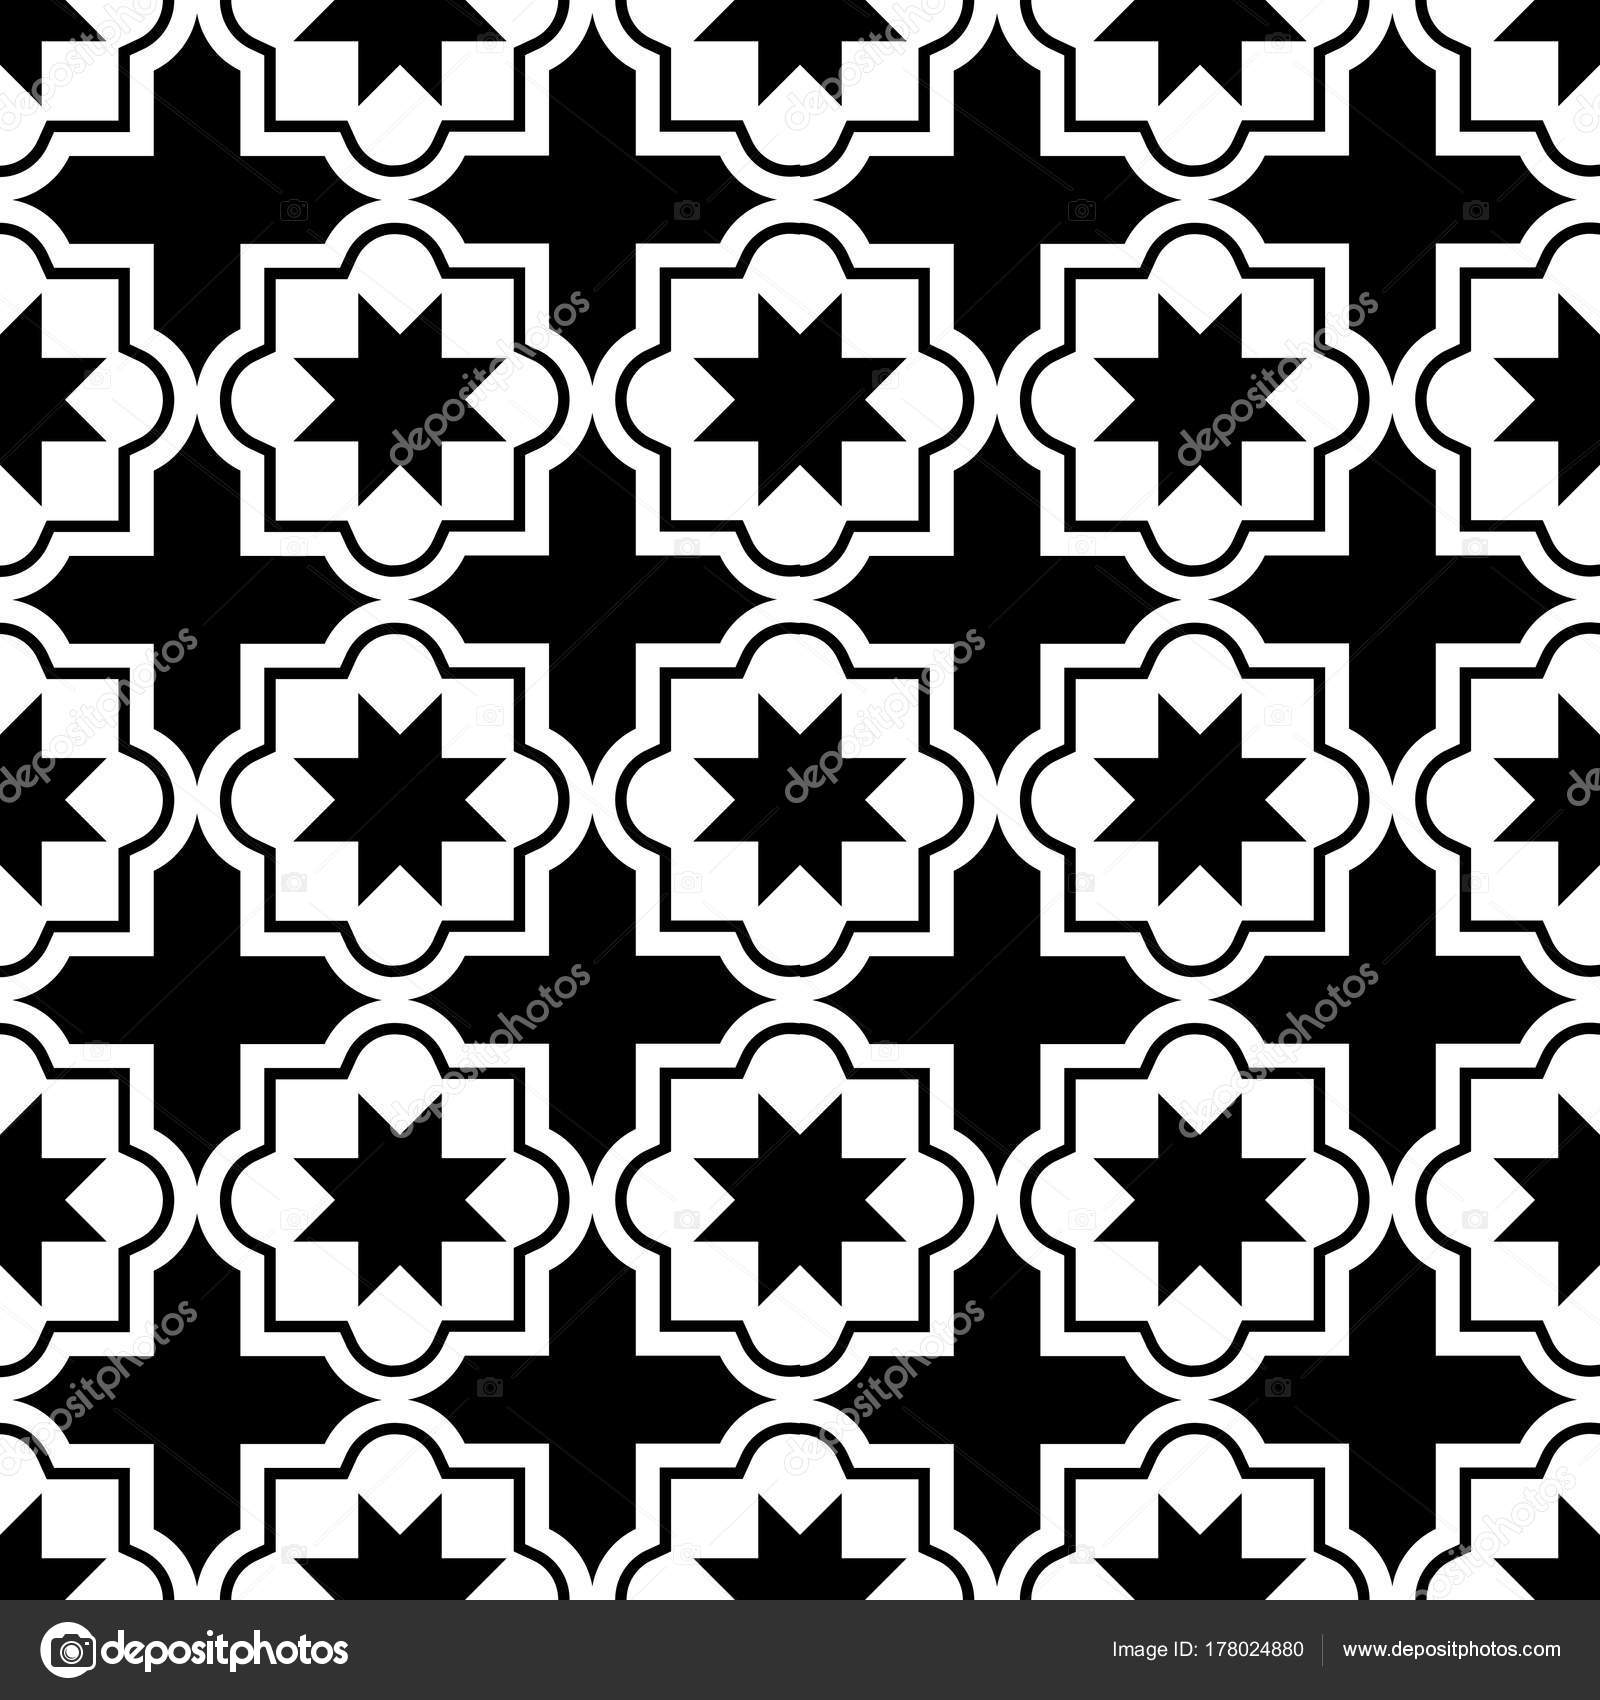 Moroccan Tiles Design Seamless Black White Pattern Geometric